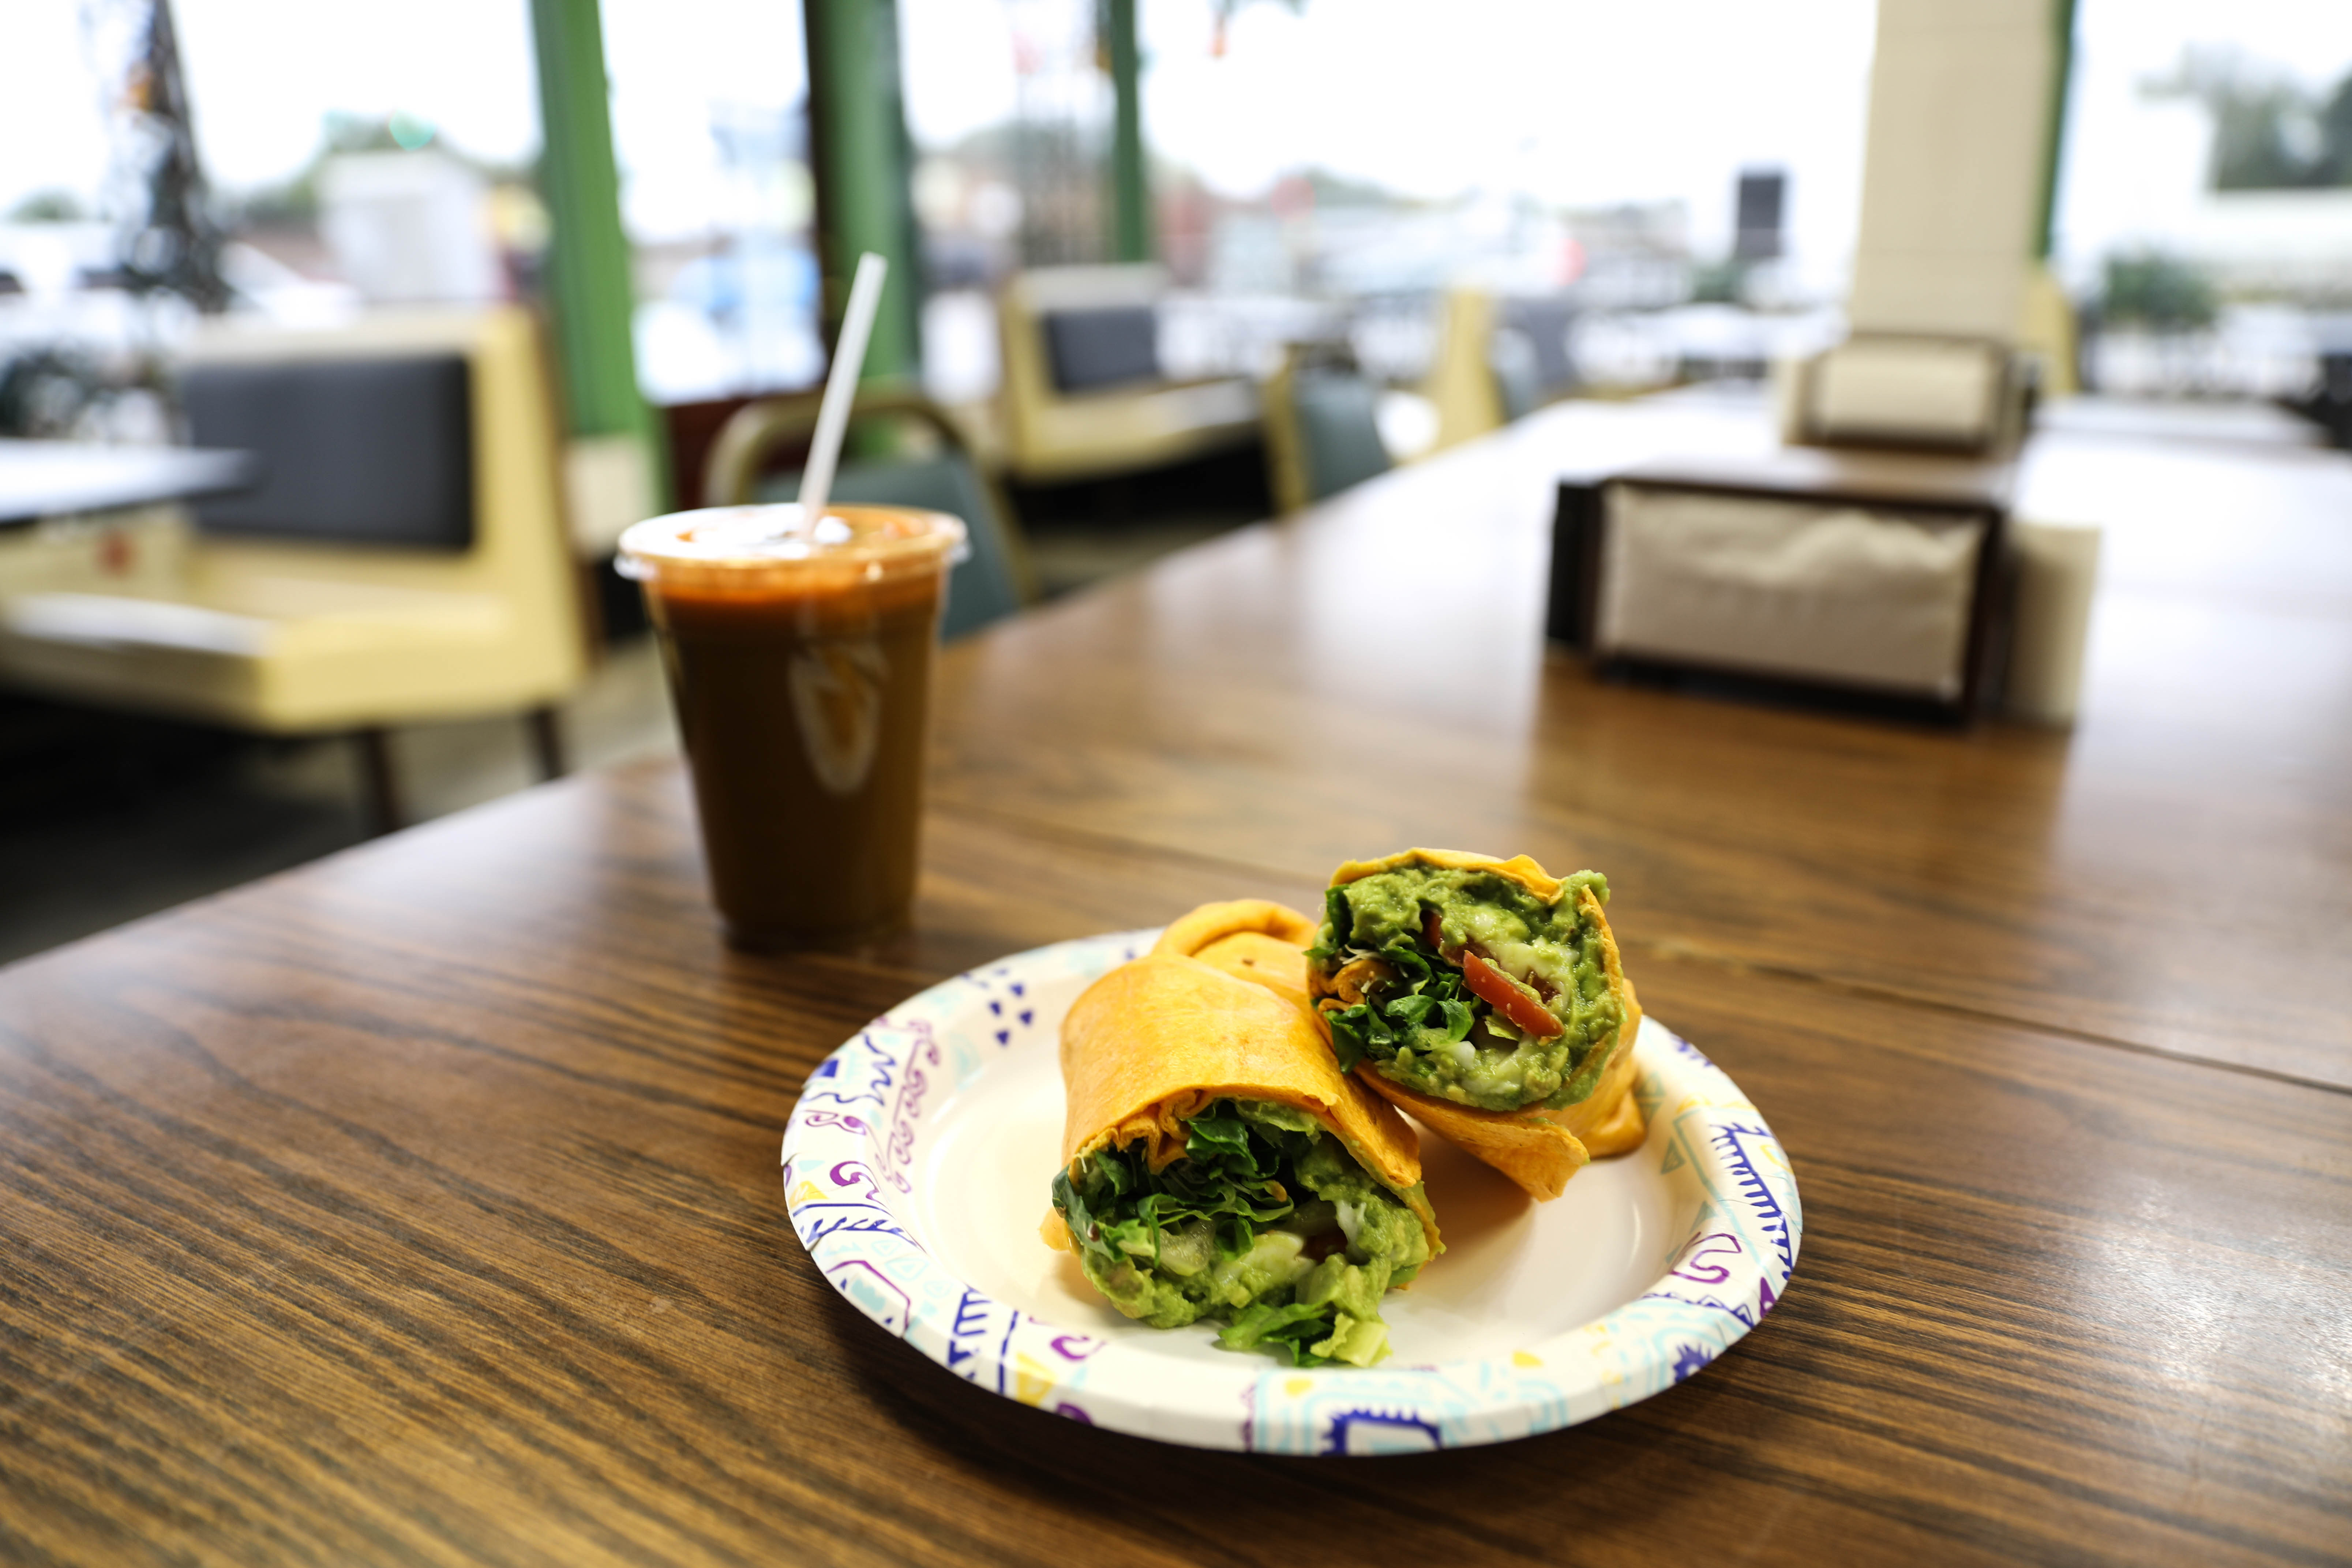 Big Al's Healthy Foods is a staple of Tulsa's food scene.